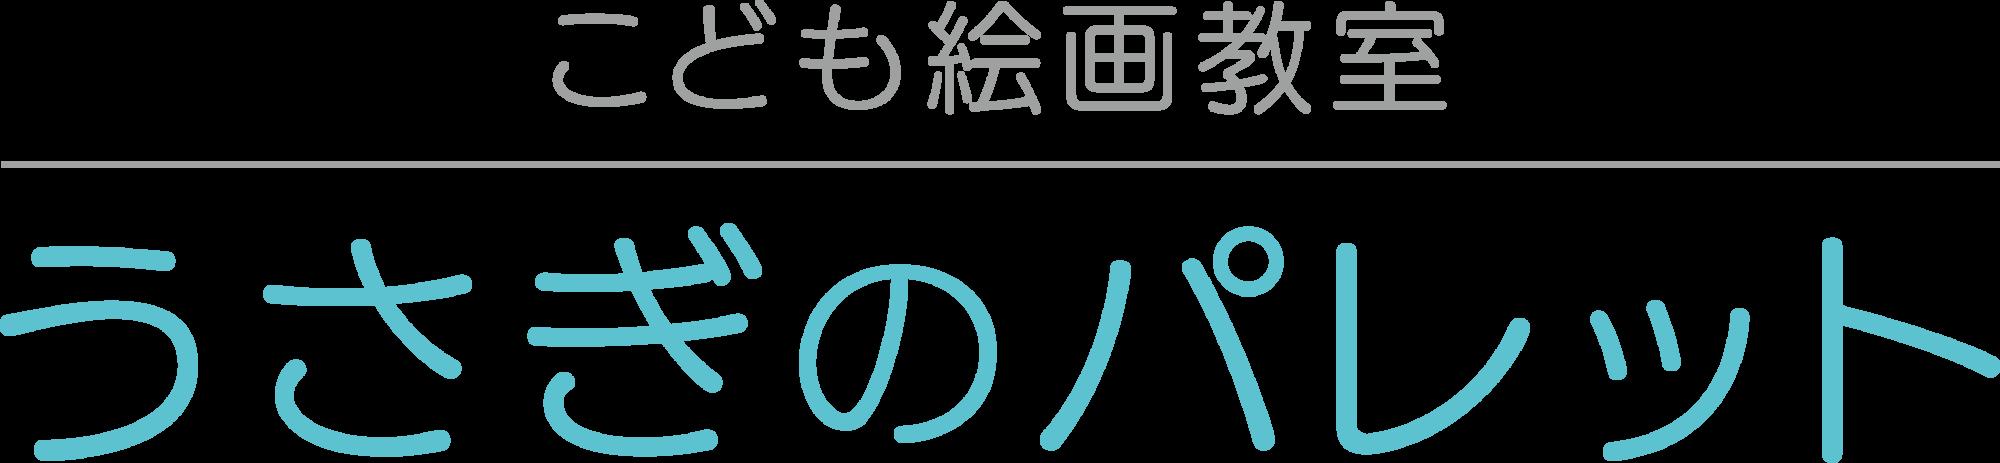 usapale_logo